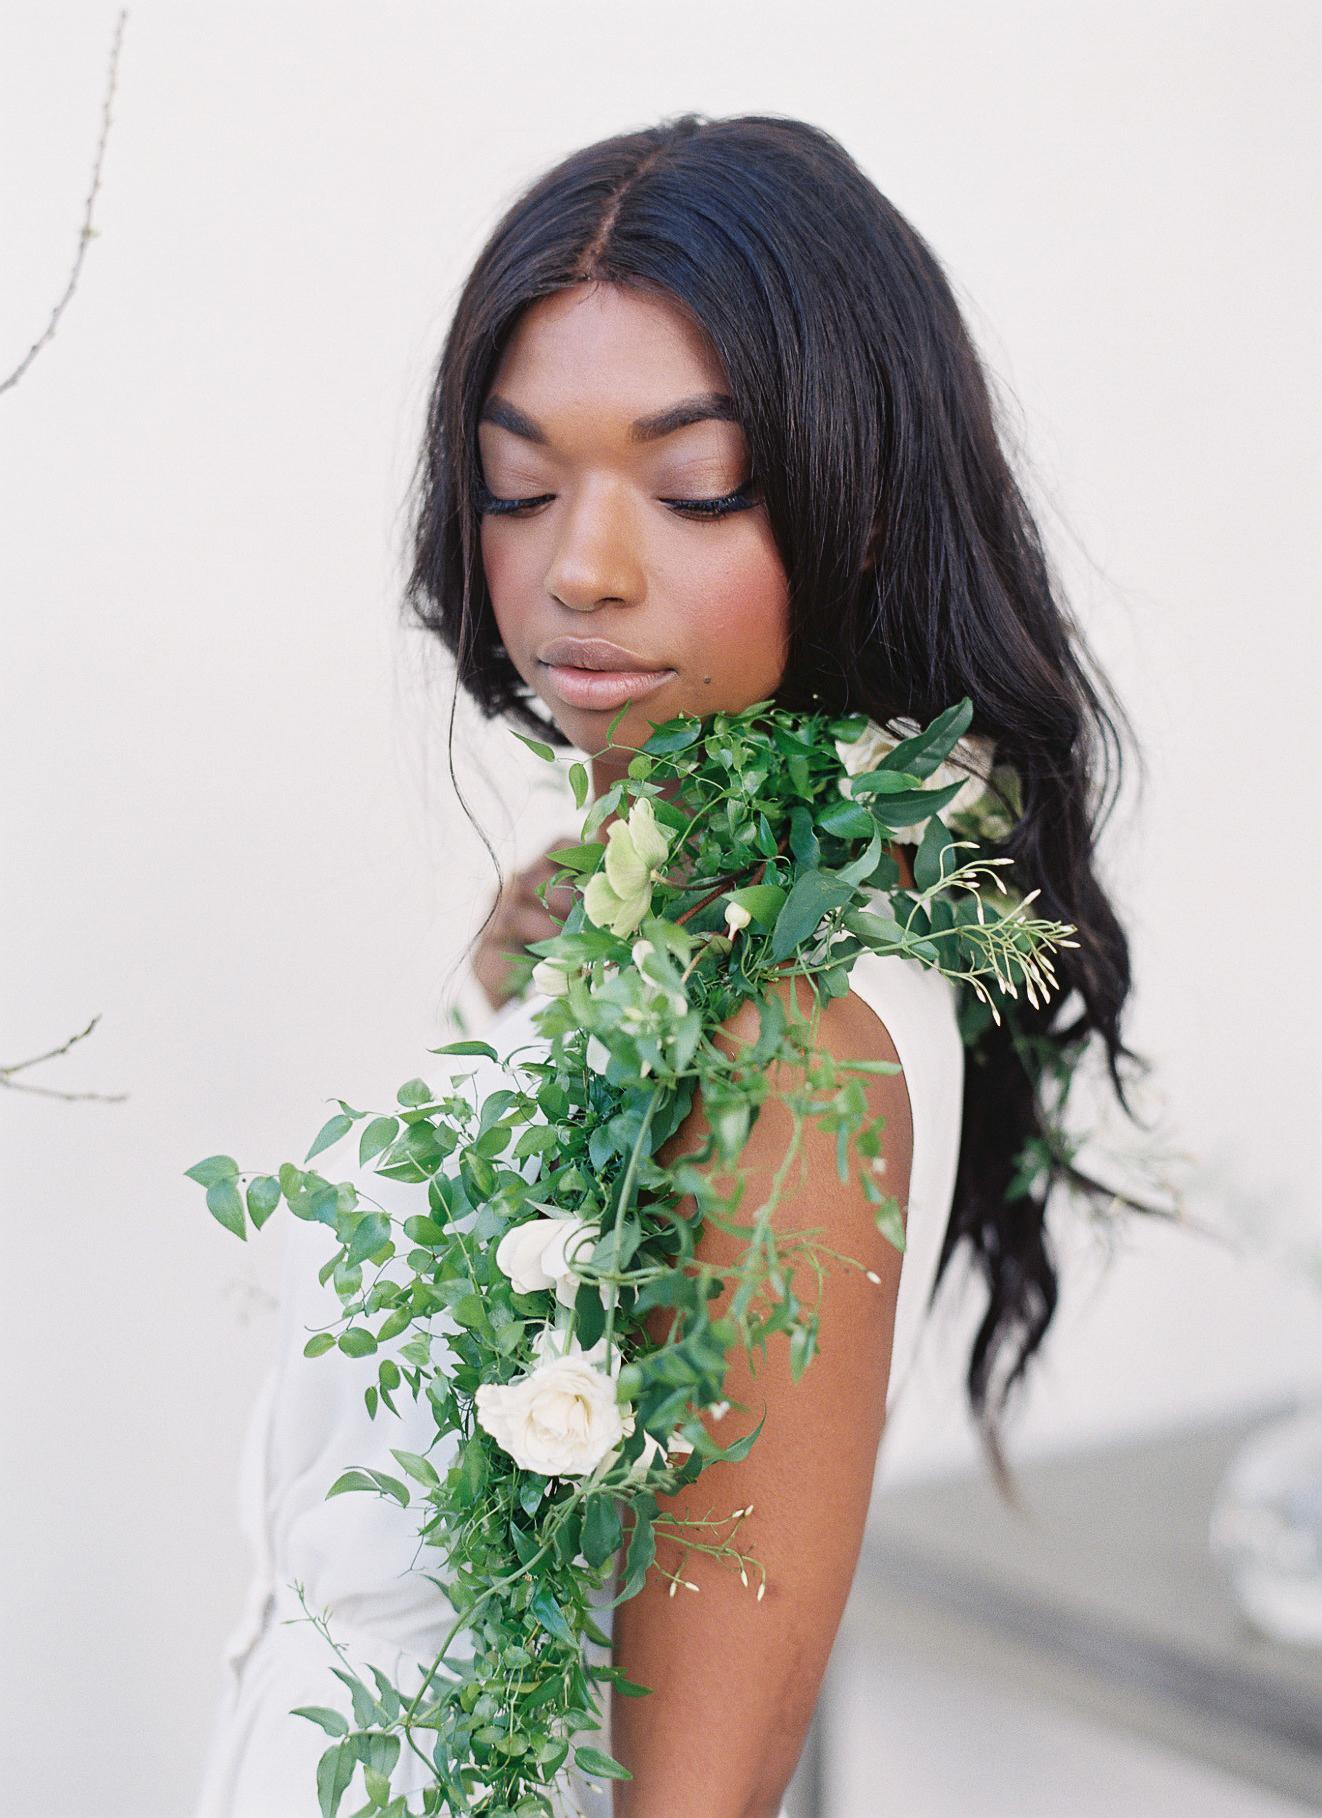 Floralessence-Esmeraldafranco-39.JPG